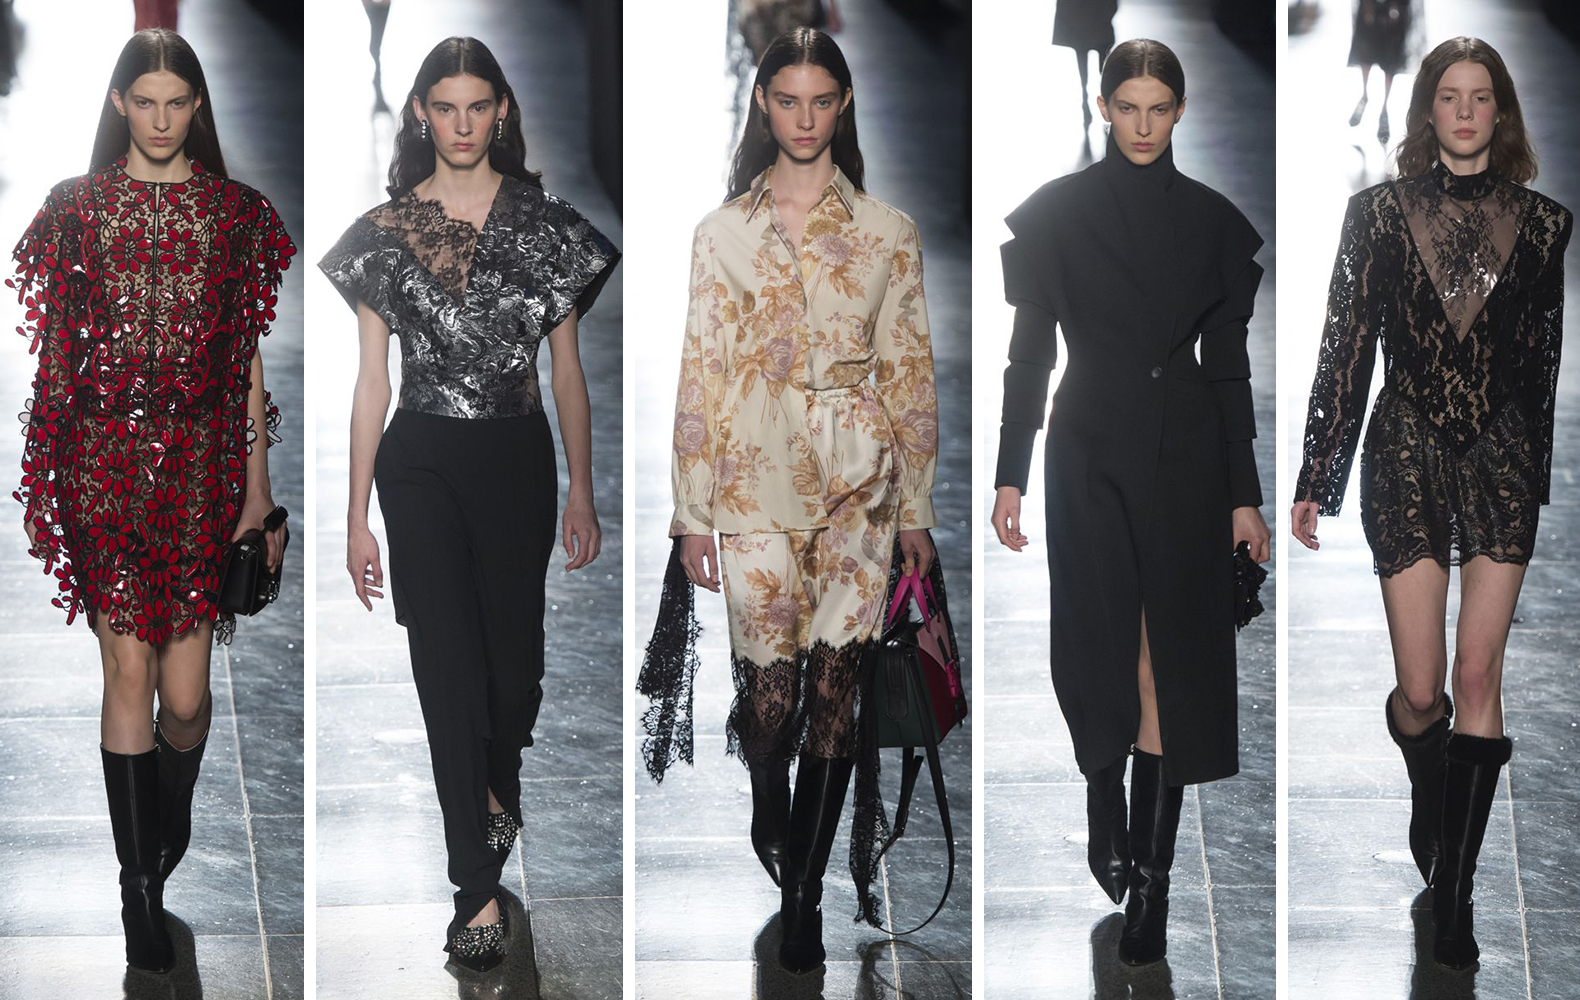 christopher_kane_2018_parizsi_divathet_fall_ready-to-wear_kollekcio.png